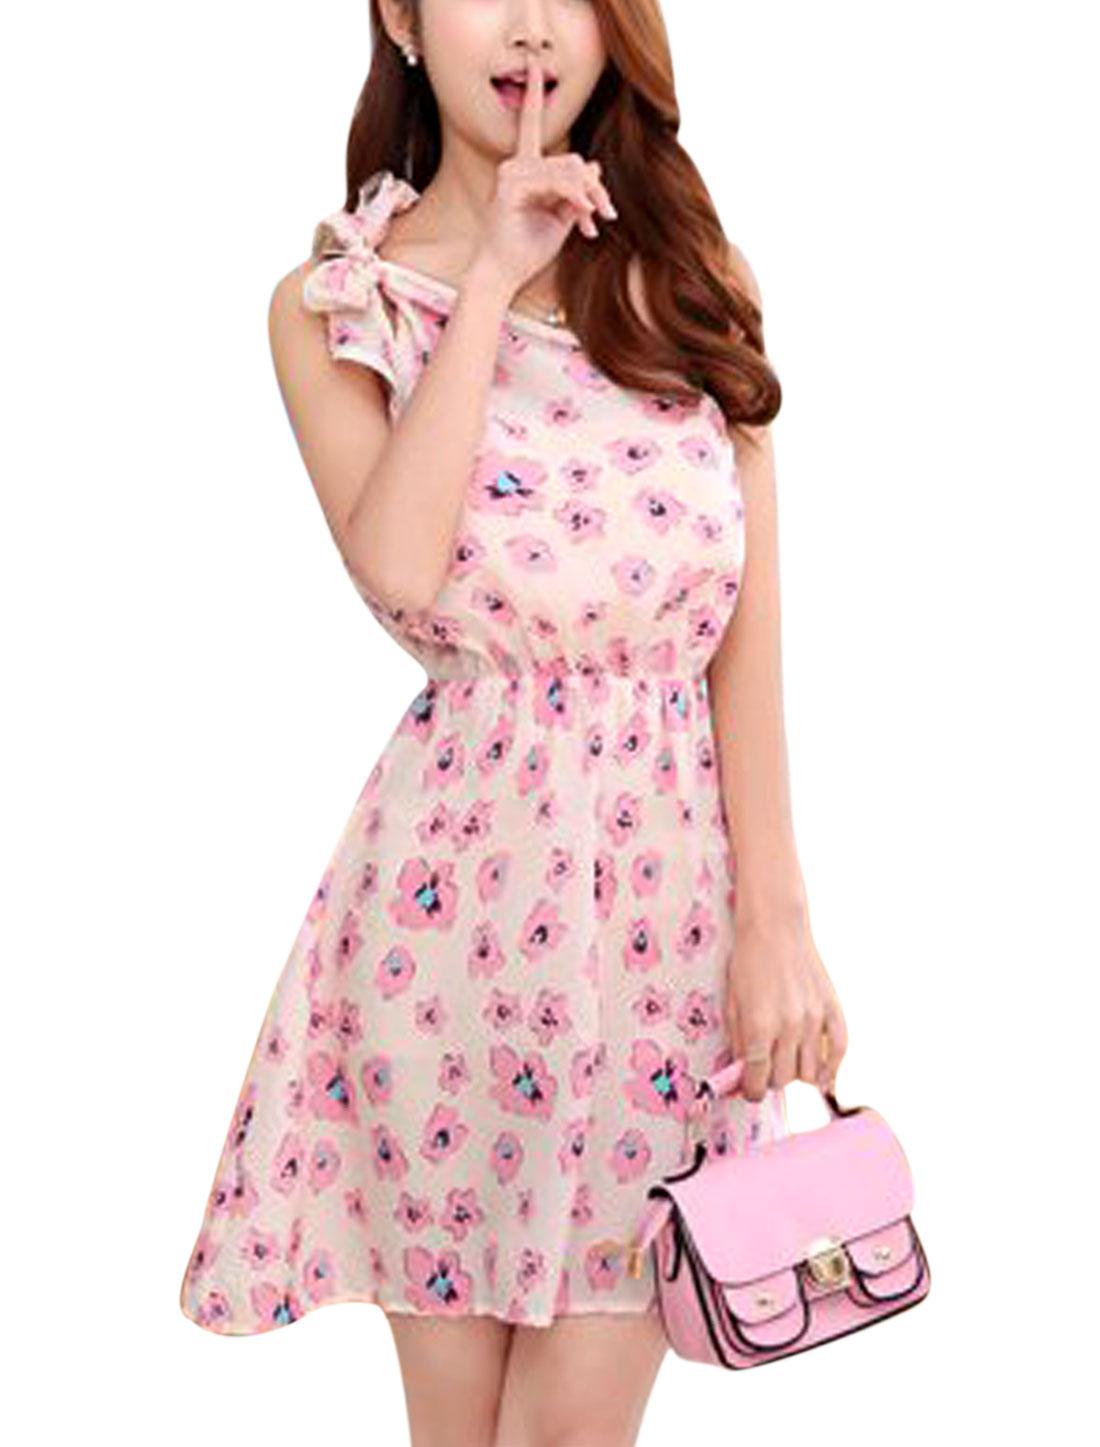 Women Elastic Waist Floral Pattern Self Tie Shoulder Dresses Beige Pink XS